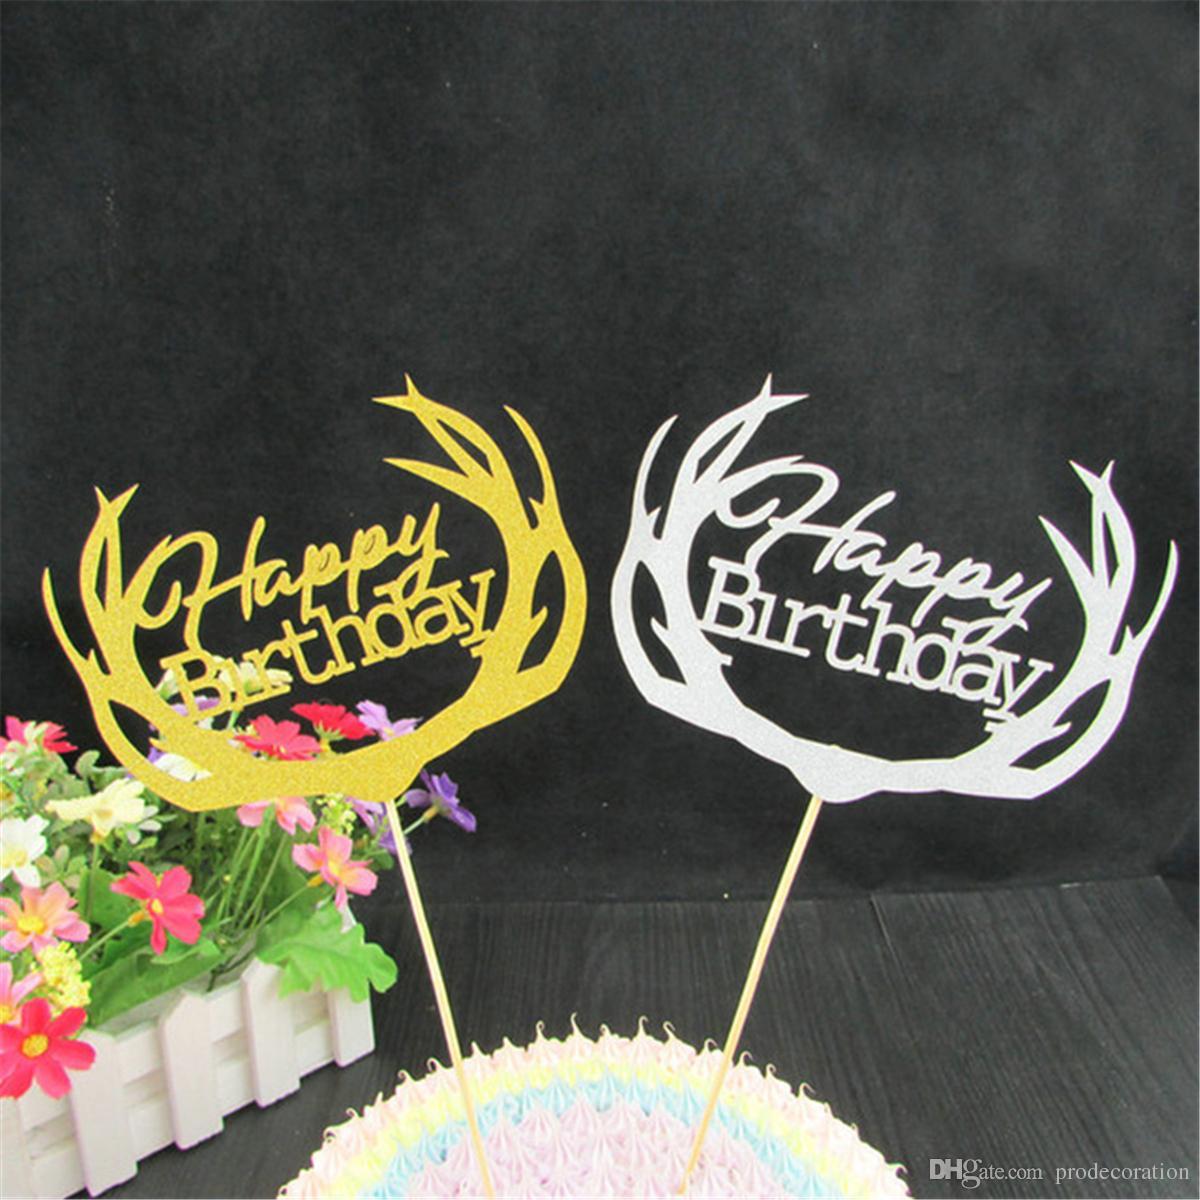 Swell 2020 Glitter Deer Happy Birthday Cake Topper Cupcake Decoration Birthday Cards Printable Inklcafe Filternl